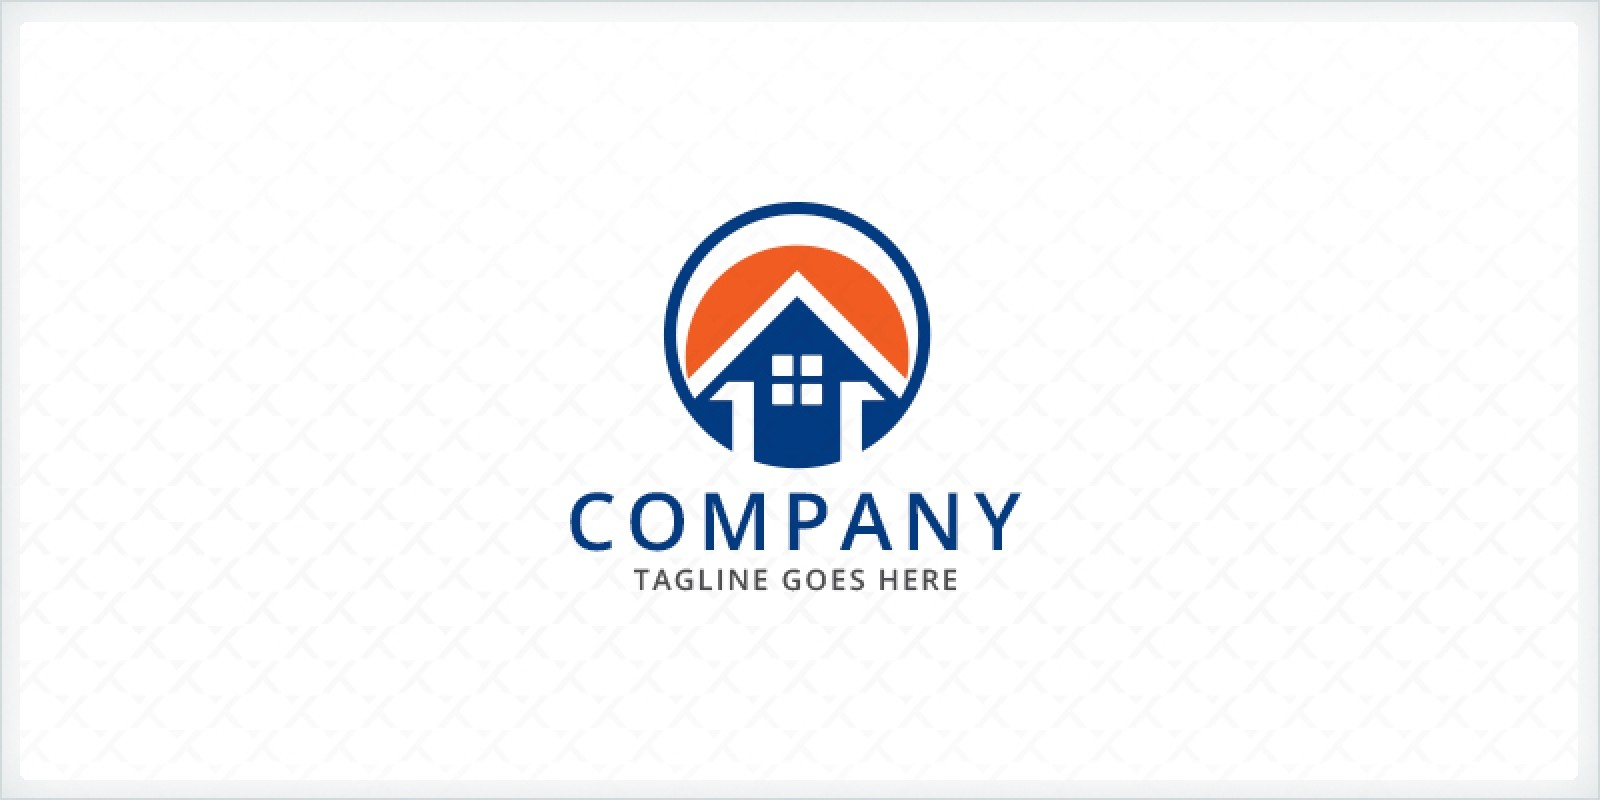 Circle Home - Real Estate Logo